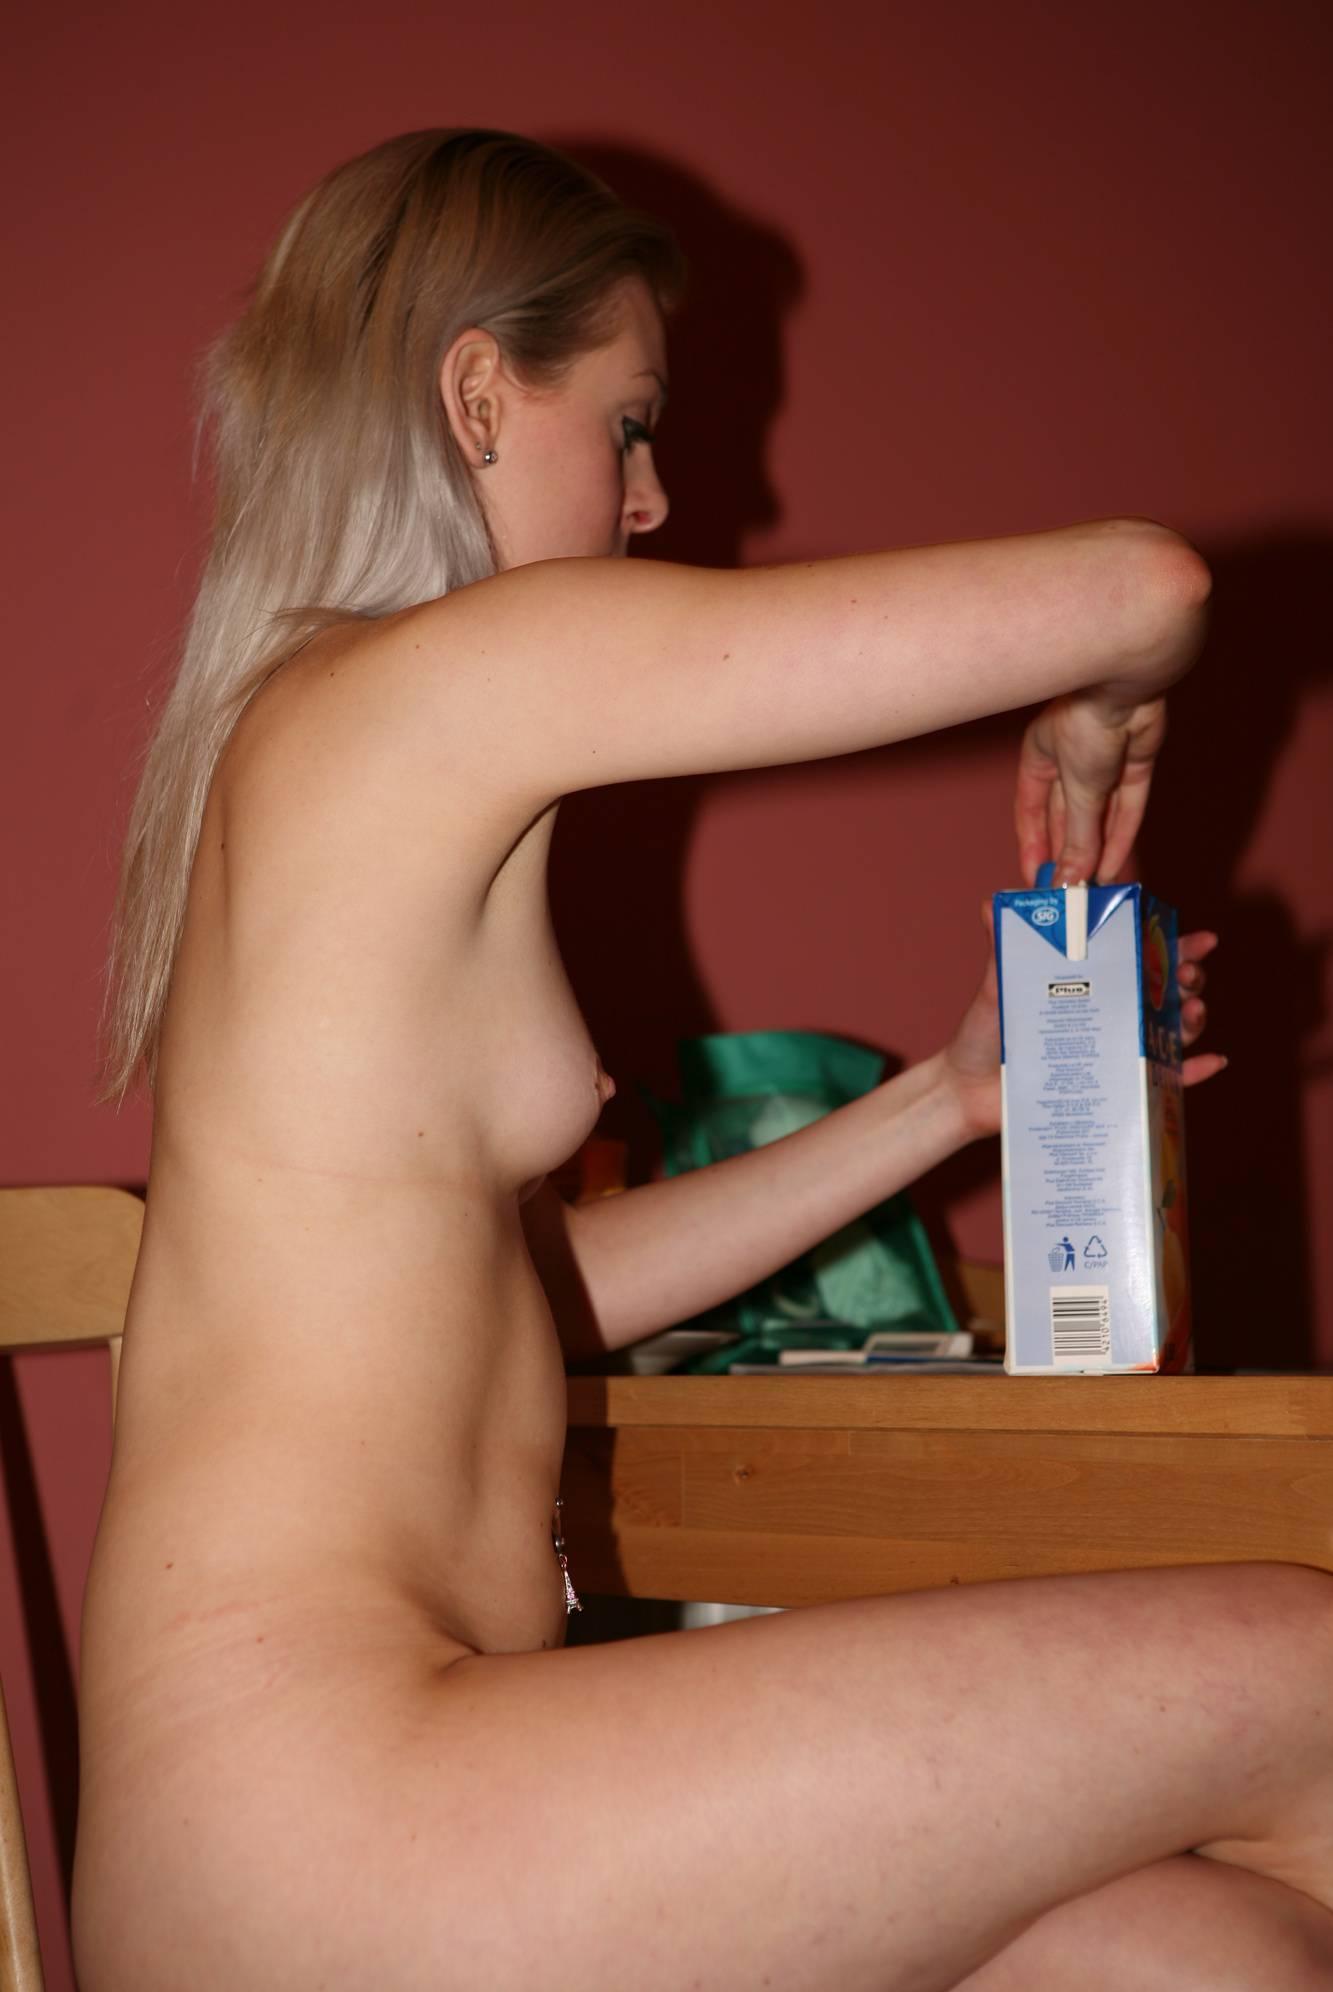 Pure Nudism Images-Girls Evening Celebration - 2